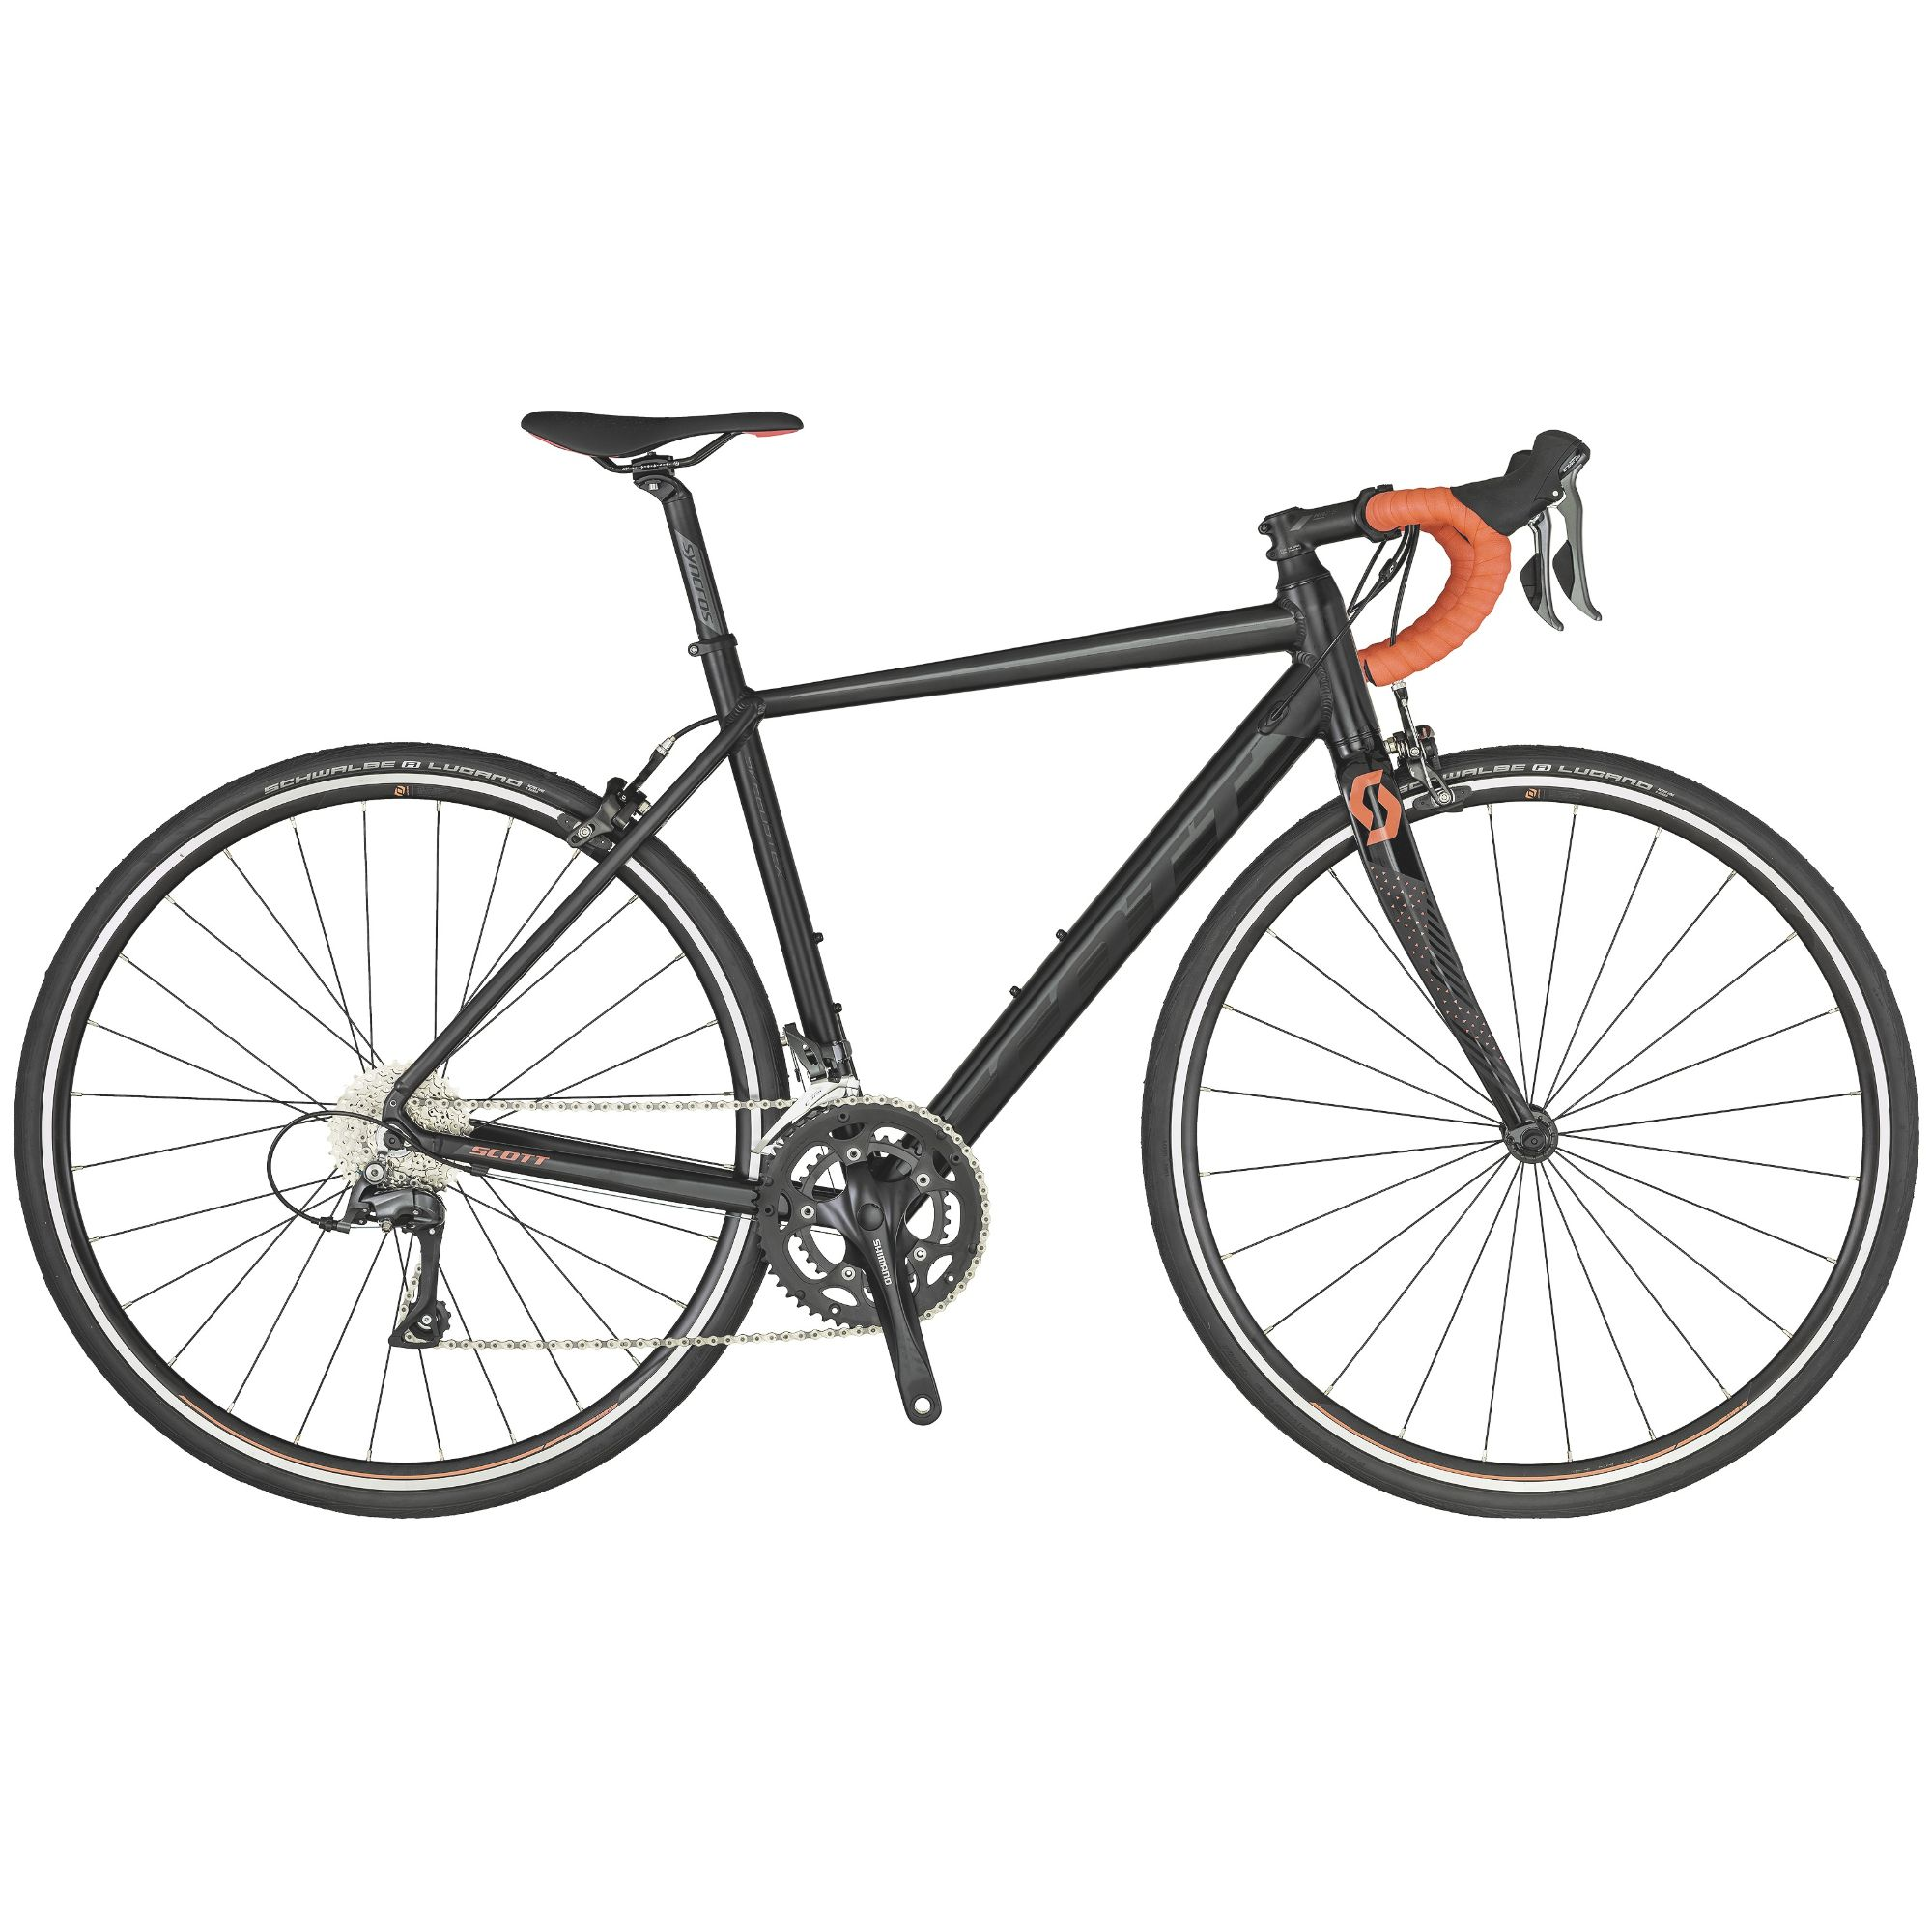 SCOTT Contessa Speedster 35 Womens Road Bike 2019